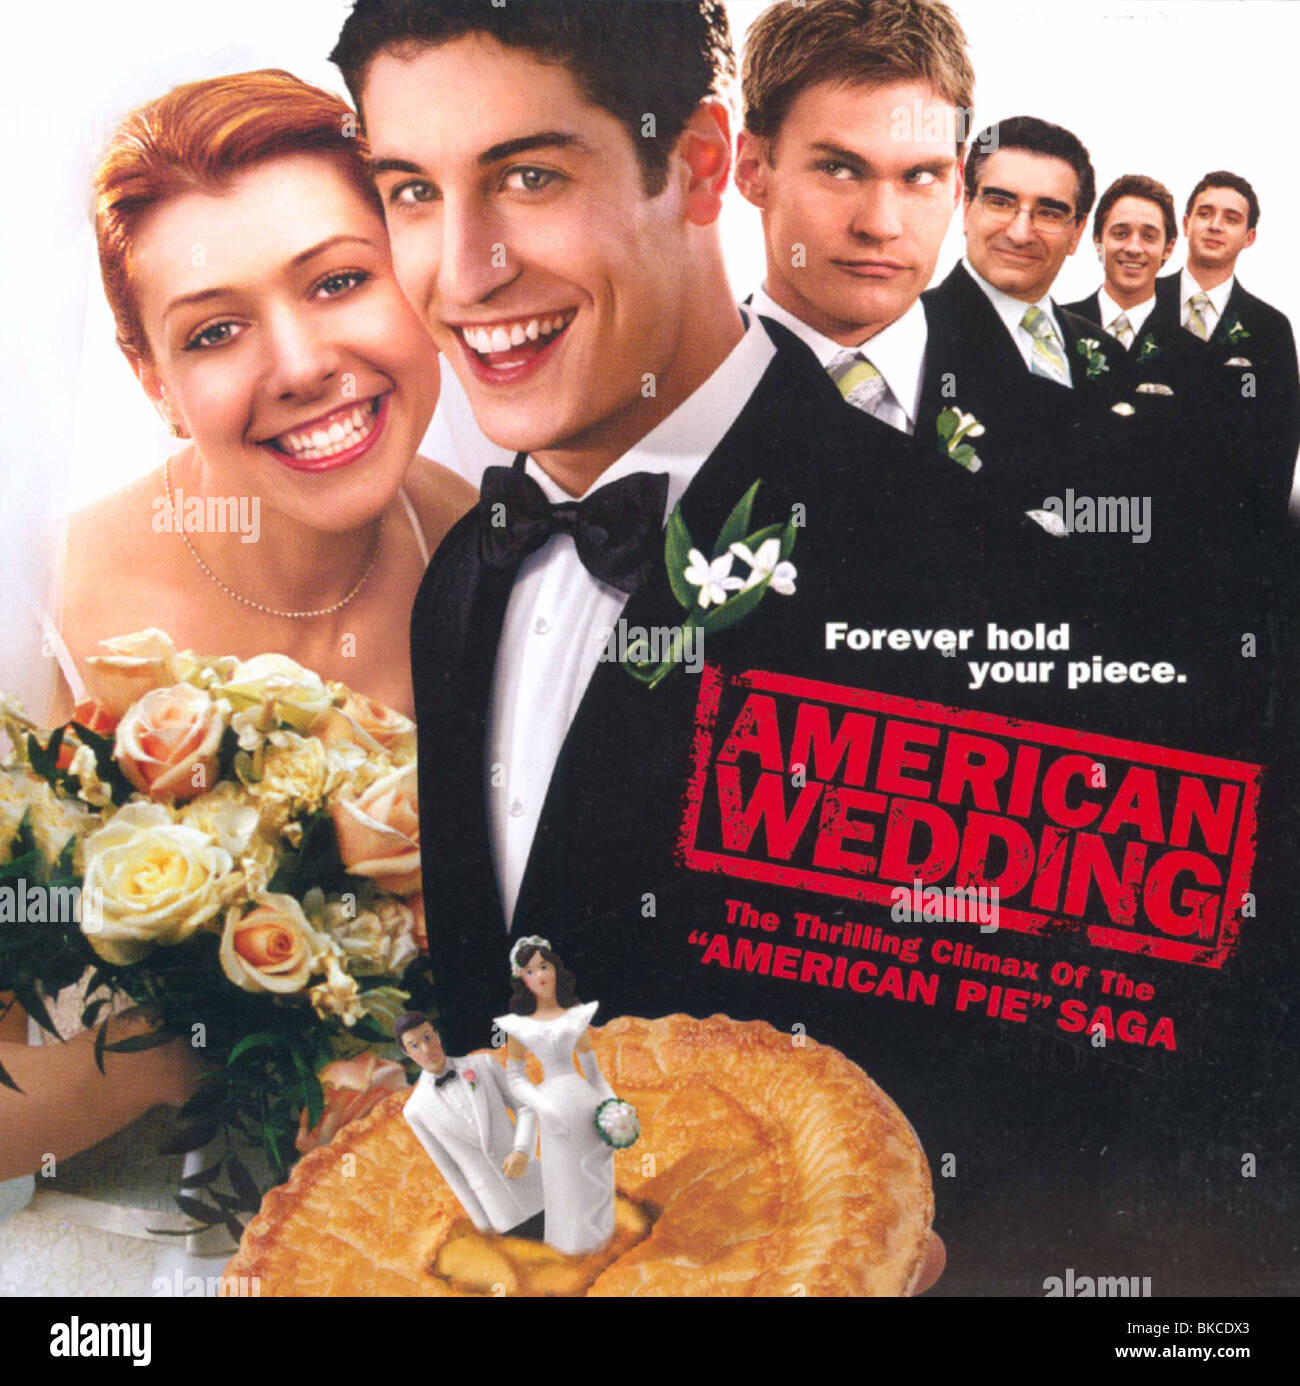 AMERICAN WEDDING 2003 PIE 3 PIECE OF ALT POSTER AMNW 001 POST